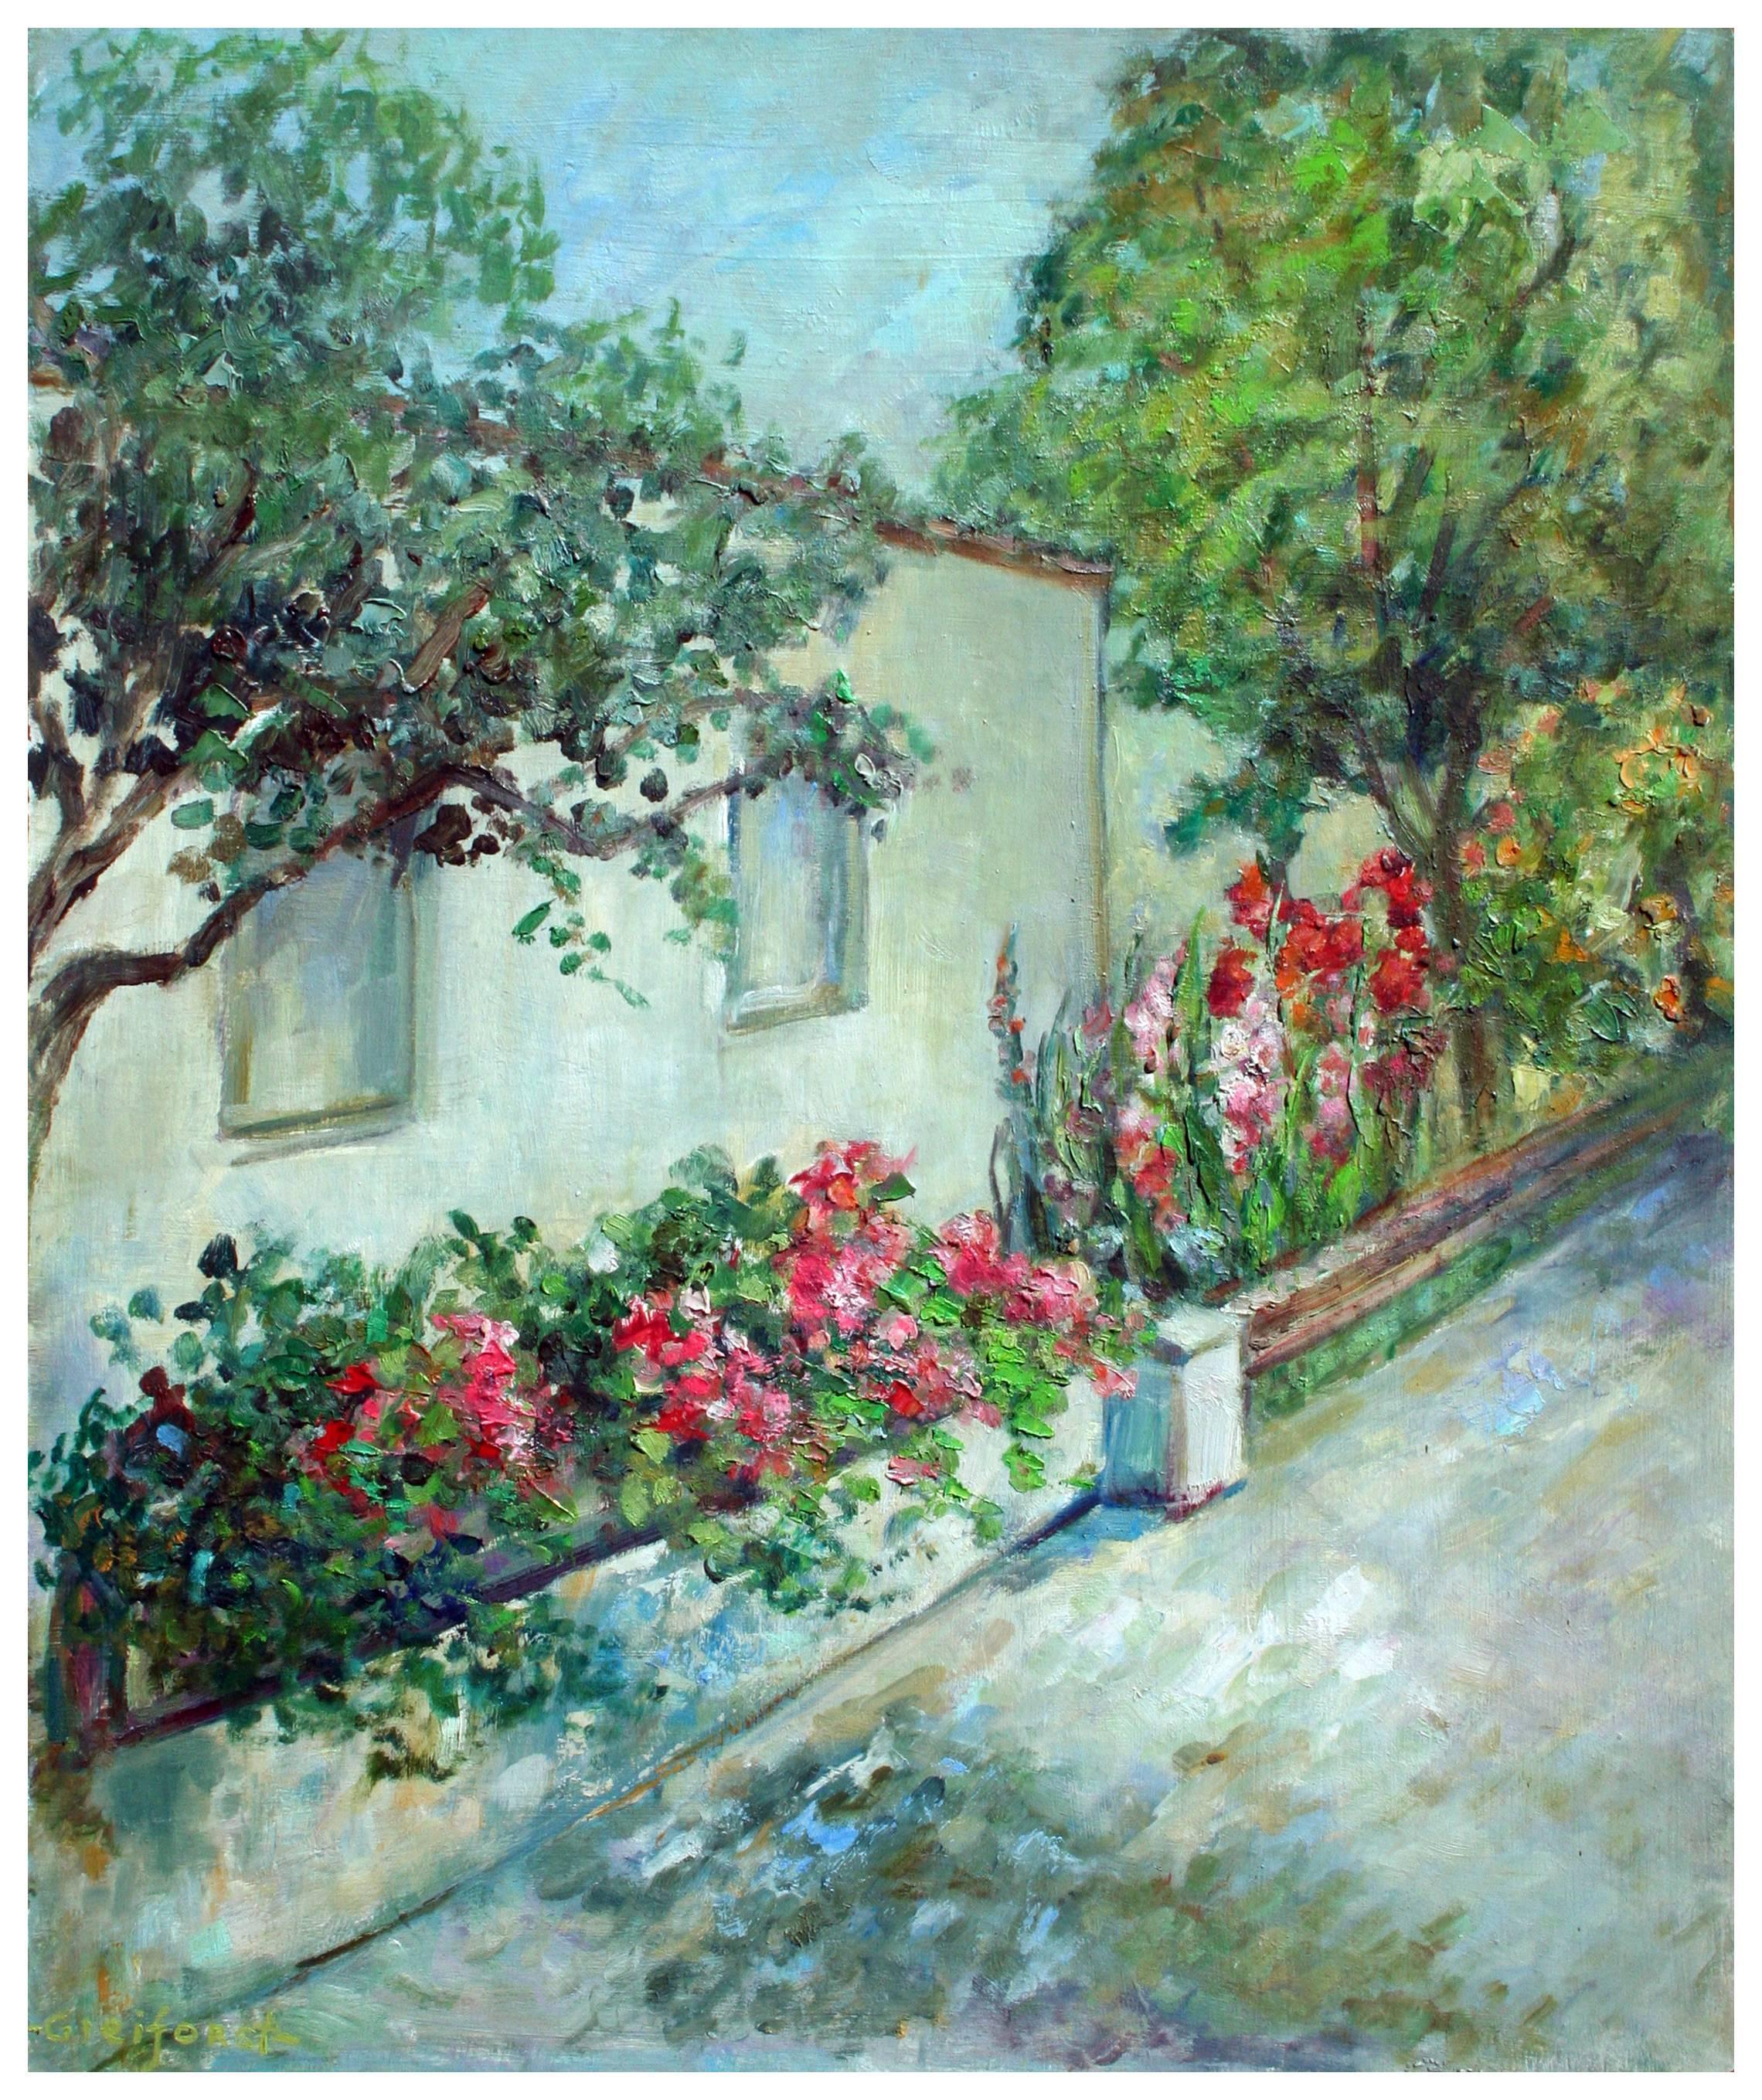 Mid Century Carmel Cottage with Flowers Landscape